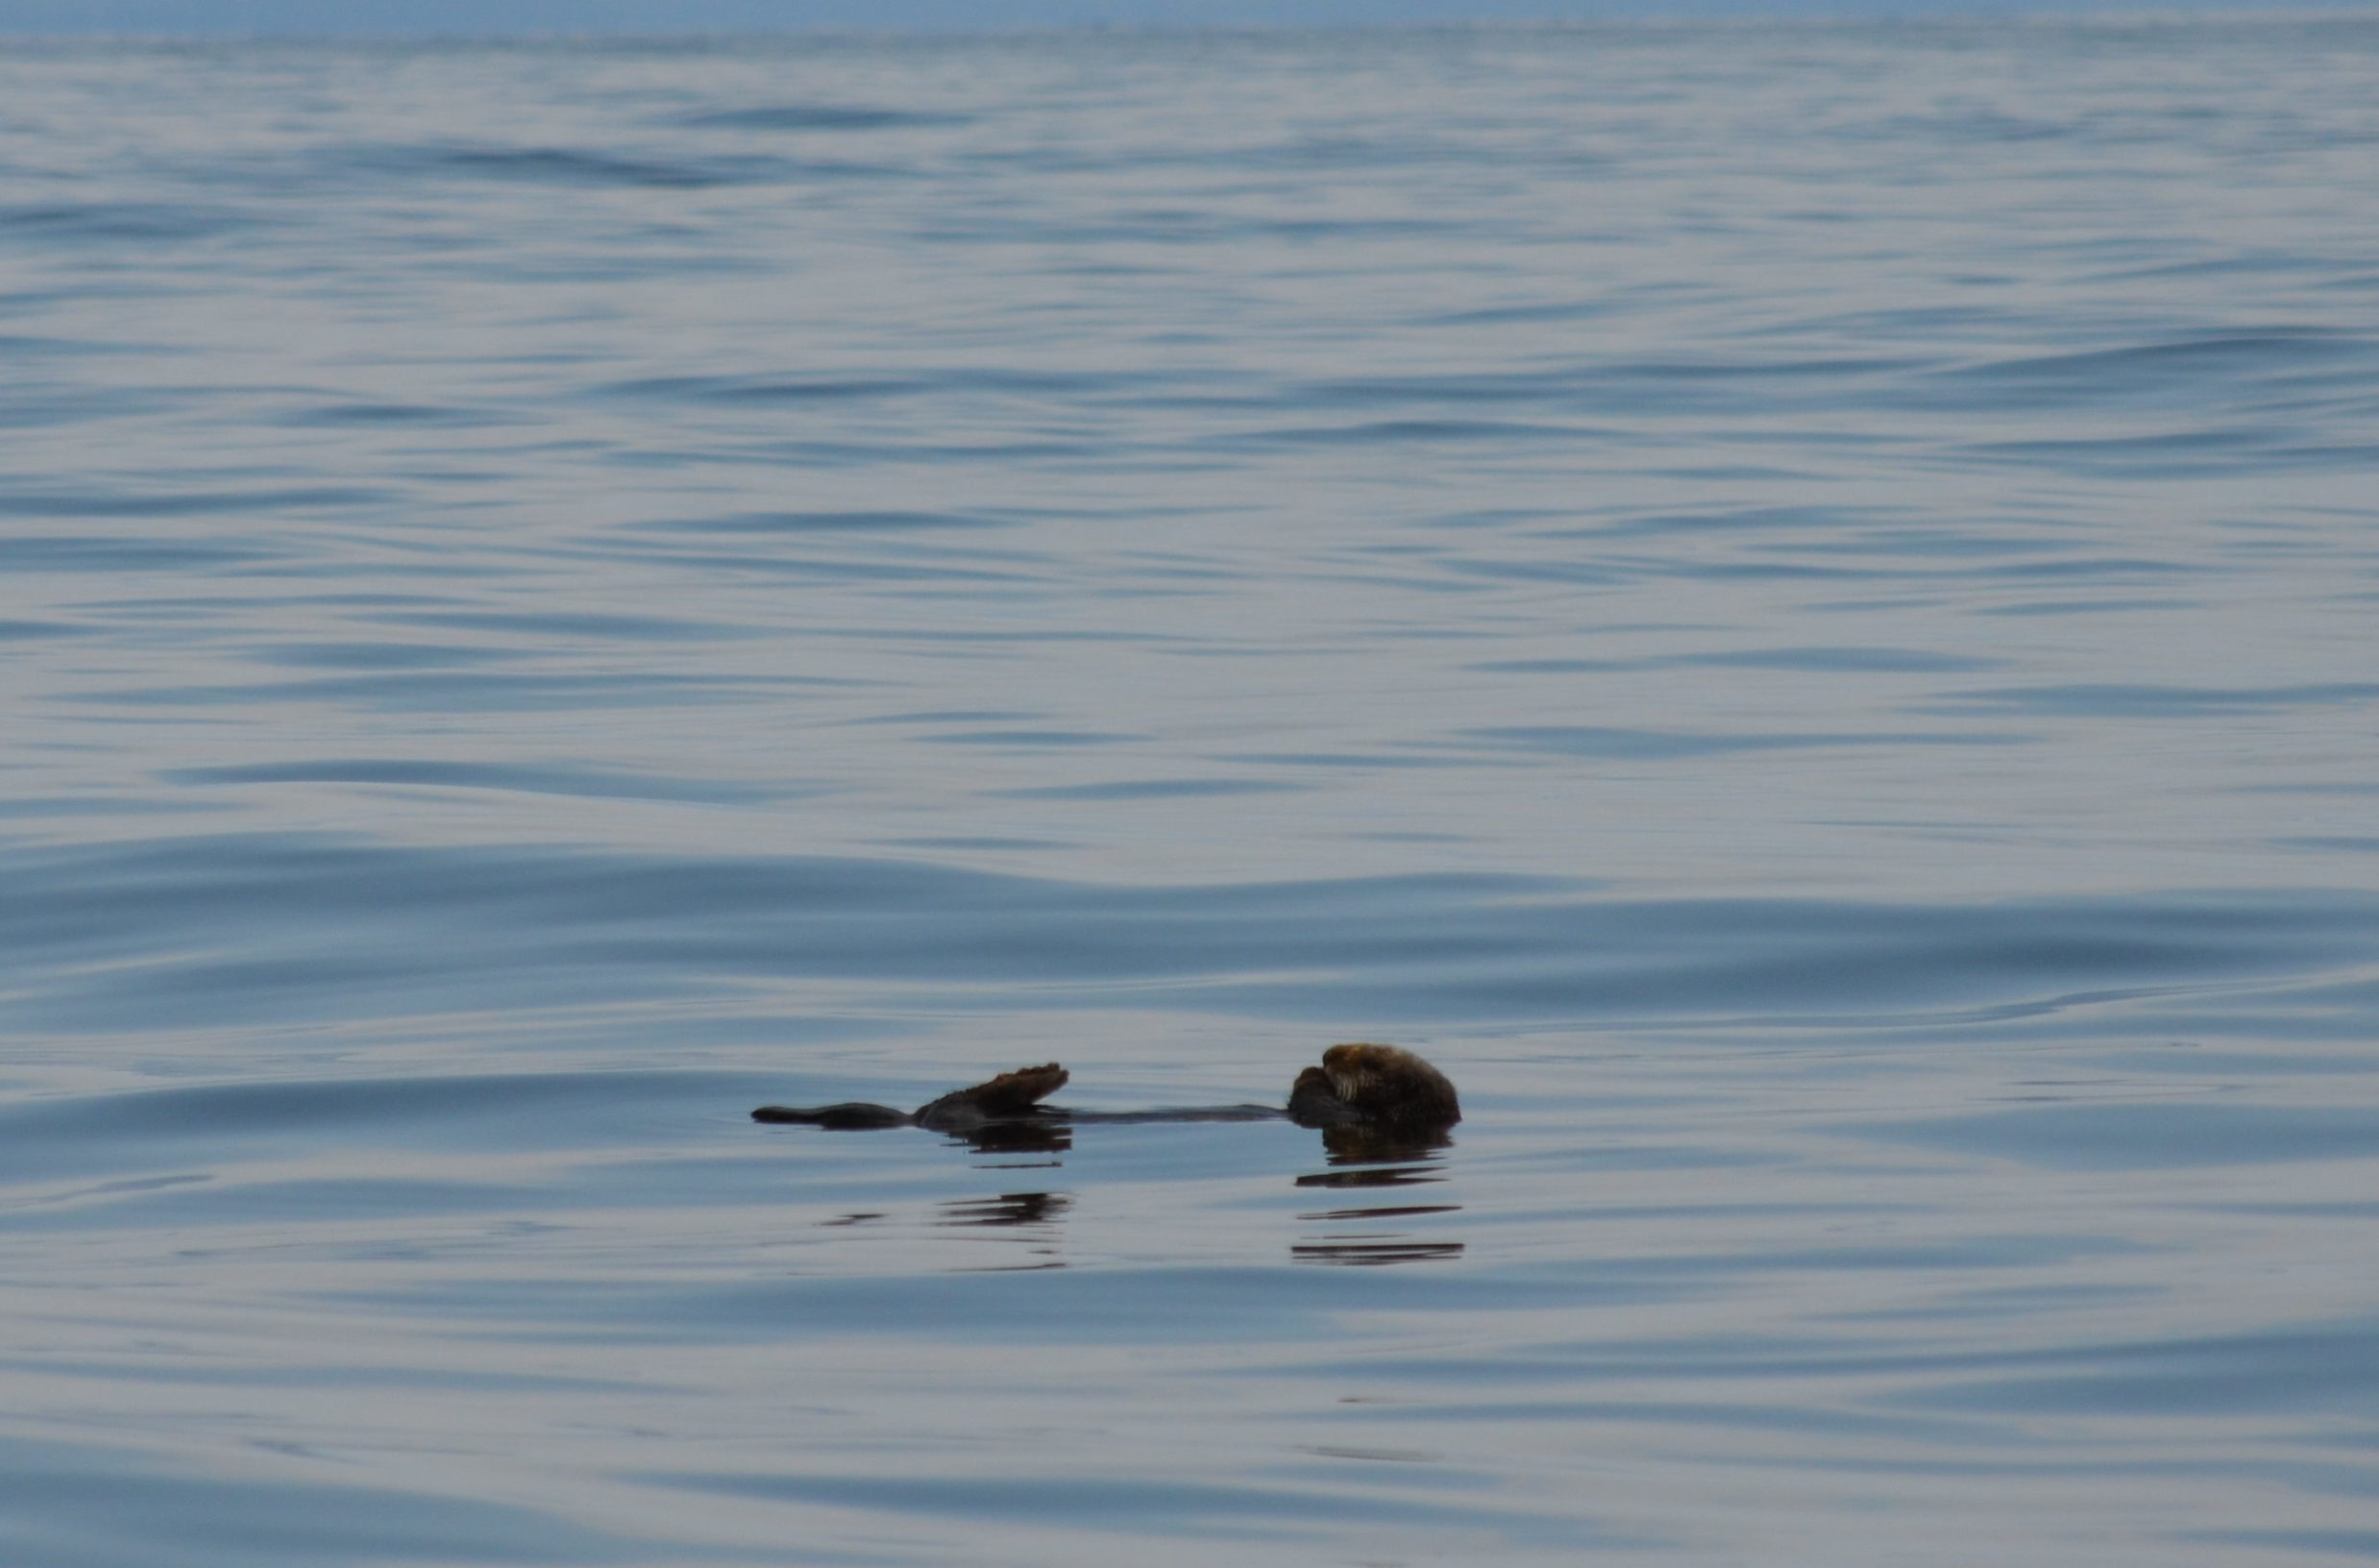 Sea otter lazing around